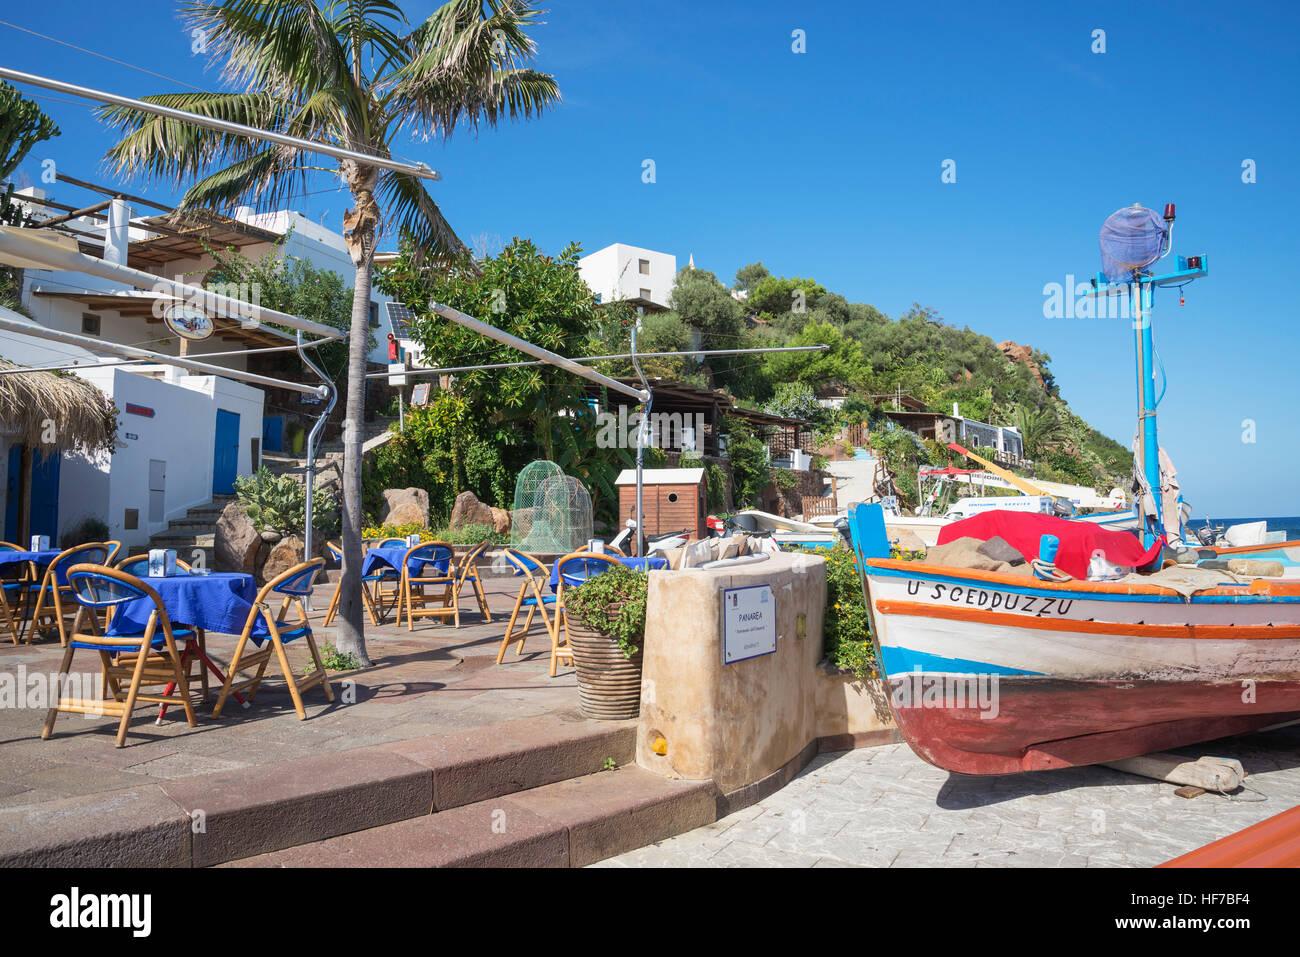 Panarea, isole Eolie, in Sicilia, Italia, Europa Immagini Stock